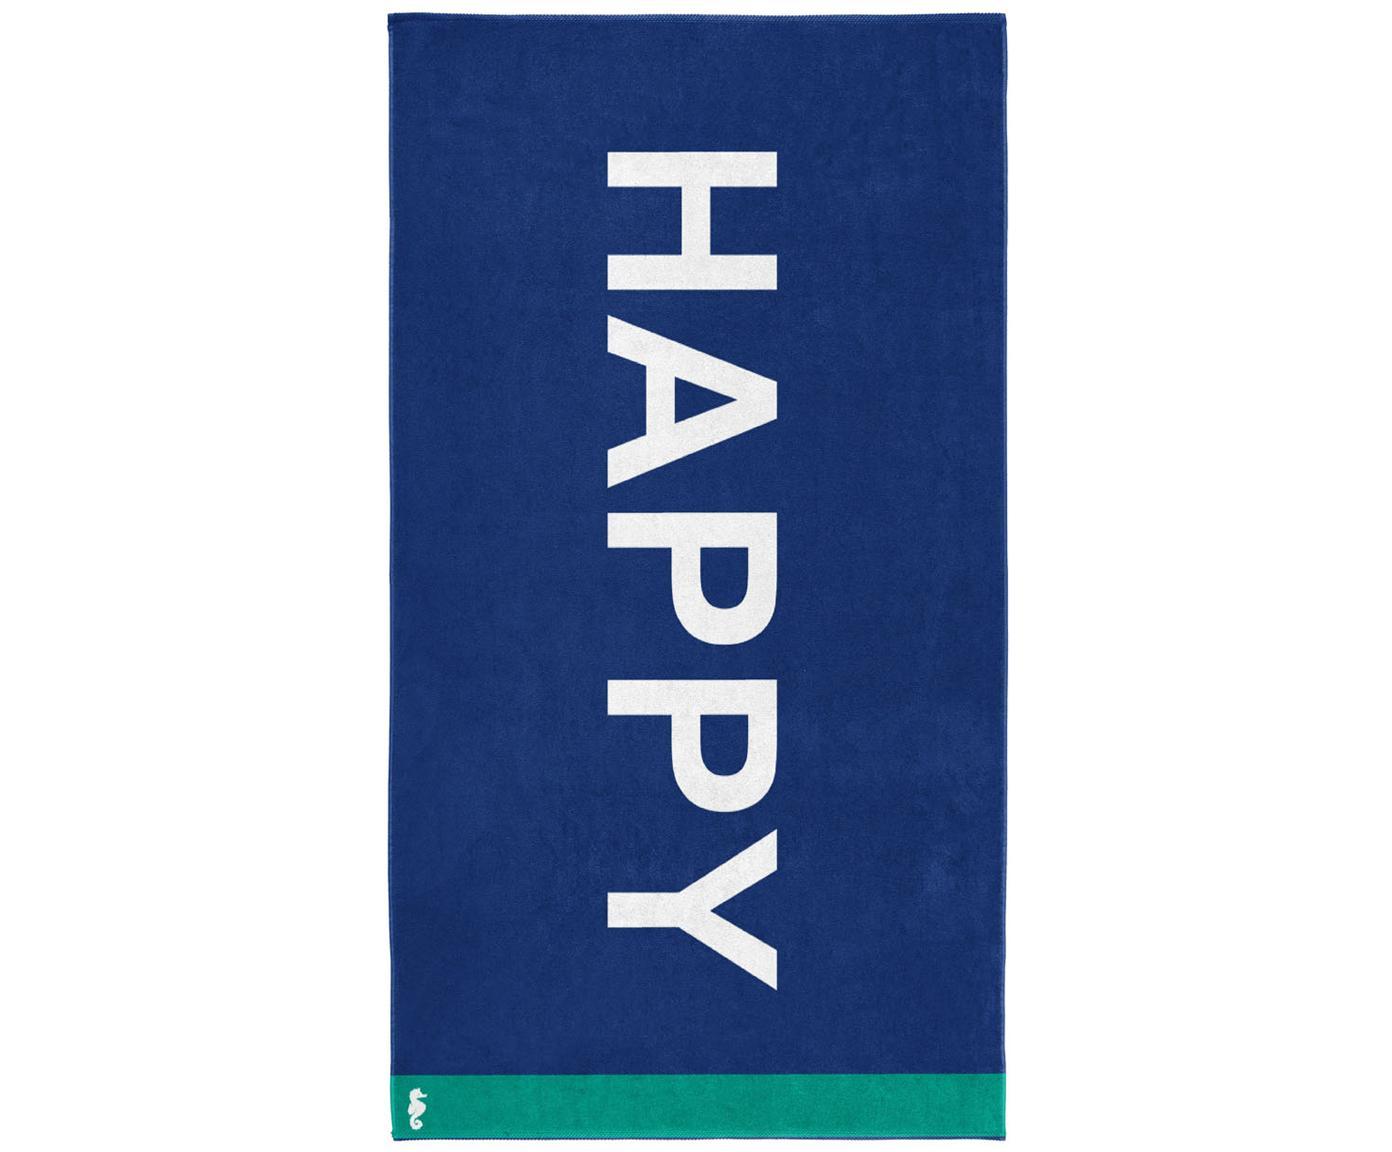 Toalla de playa Happy, Velour (algodón) Gramaje medio, 420g/m², Azul, blanco, verde, An 100 x L 180 cm